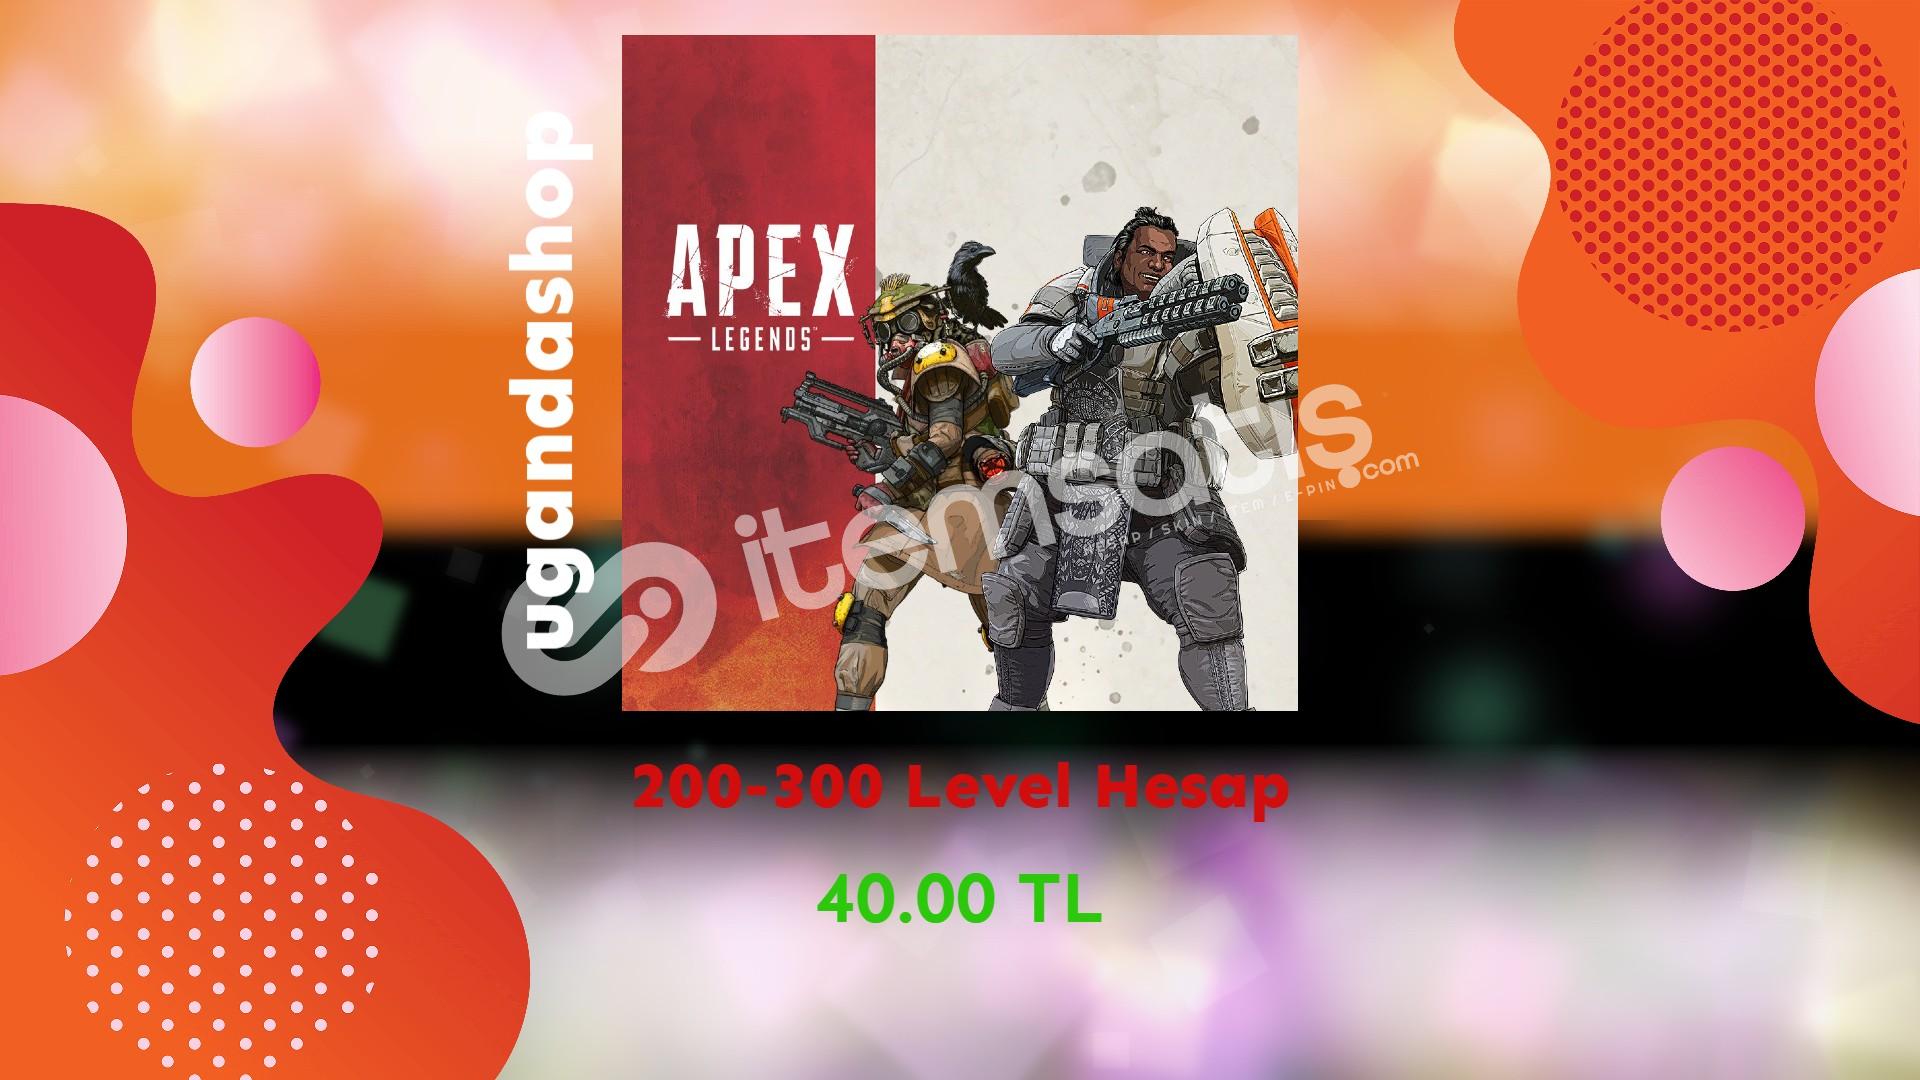 Apex Legends 200-300 Level Origin Hesap + Garanti